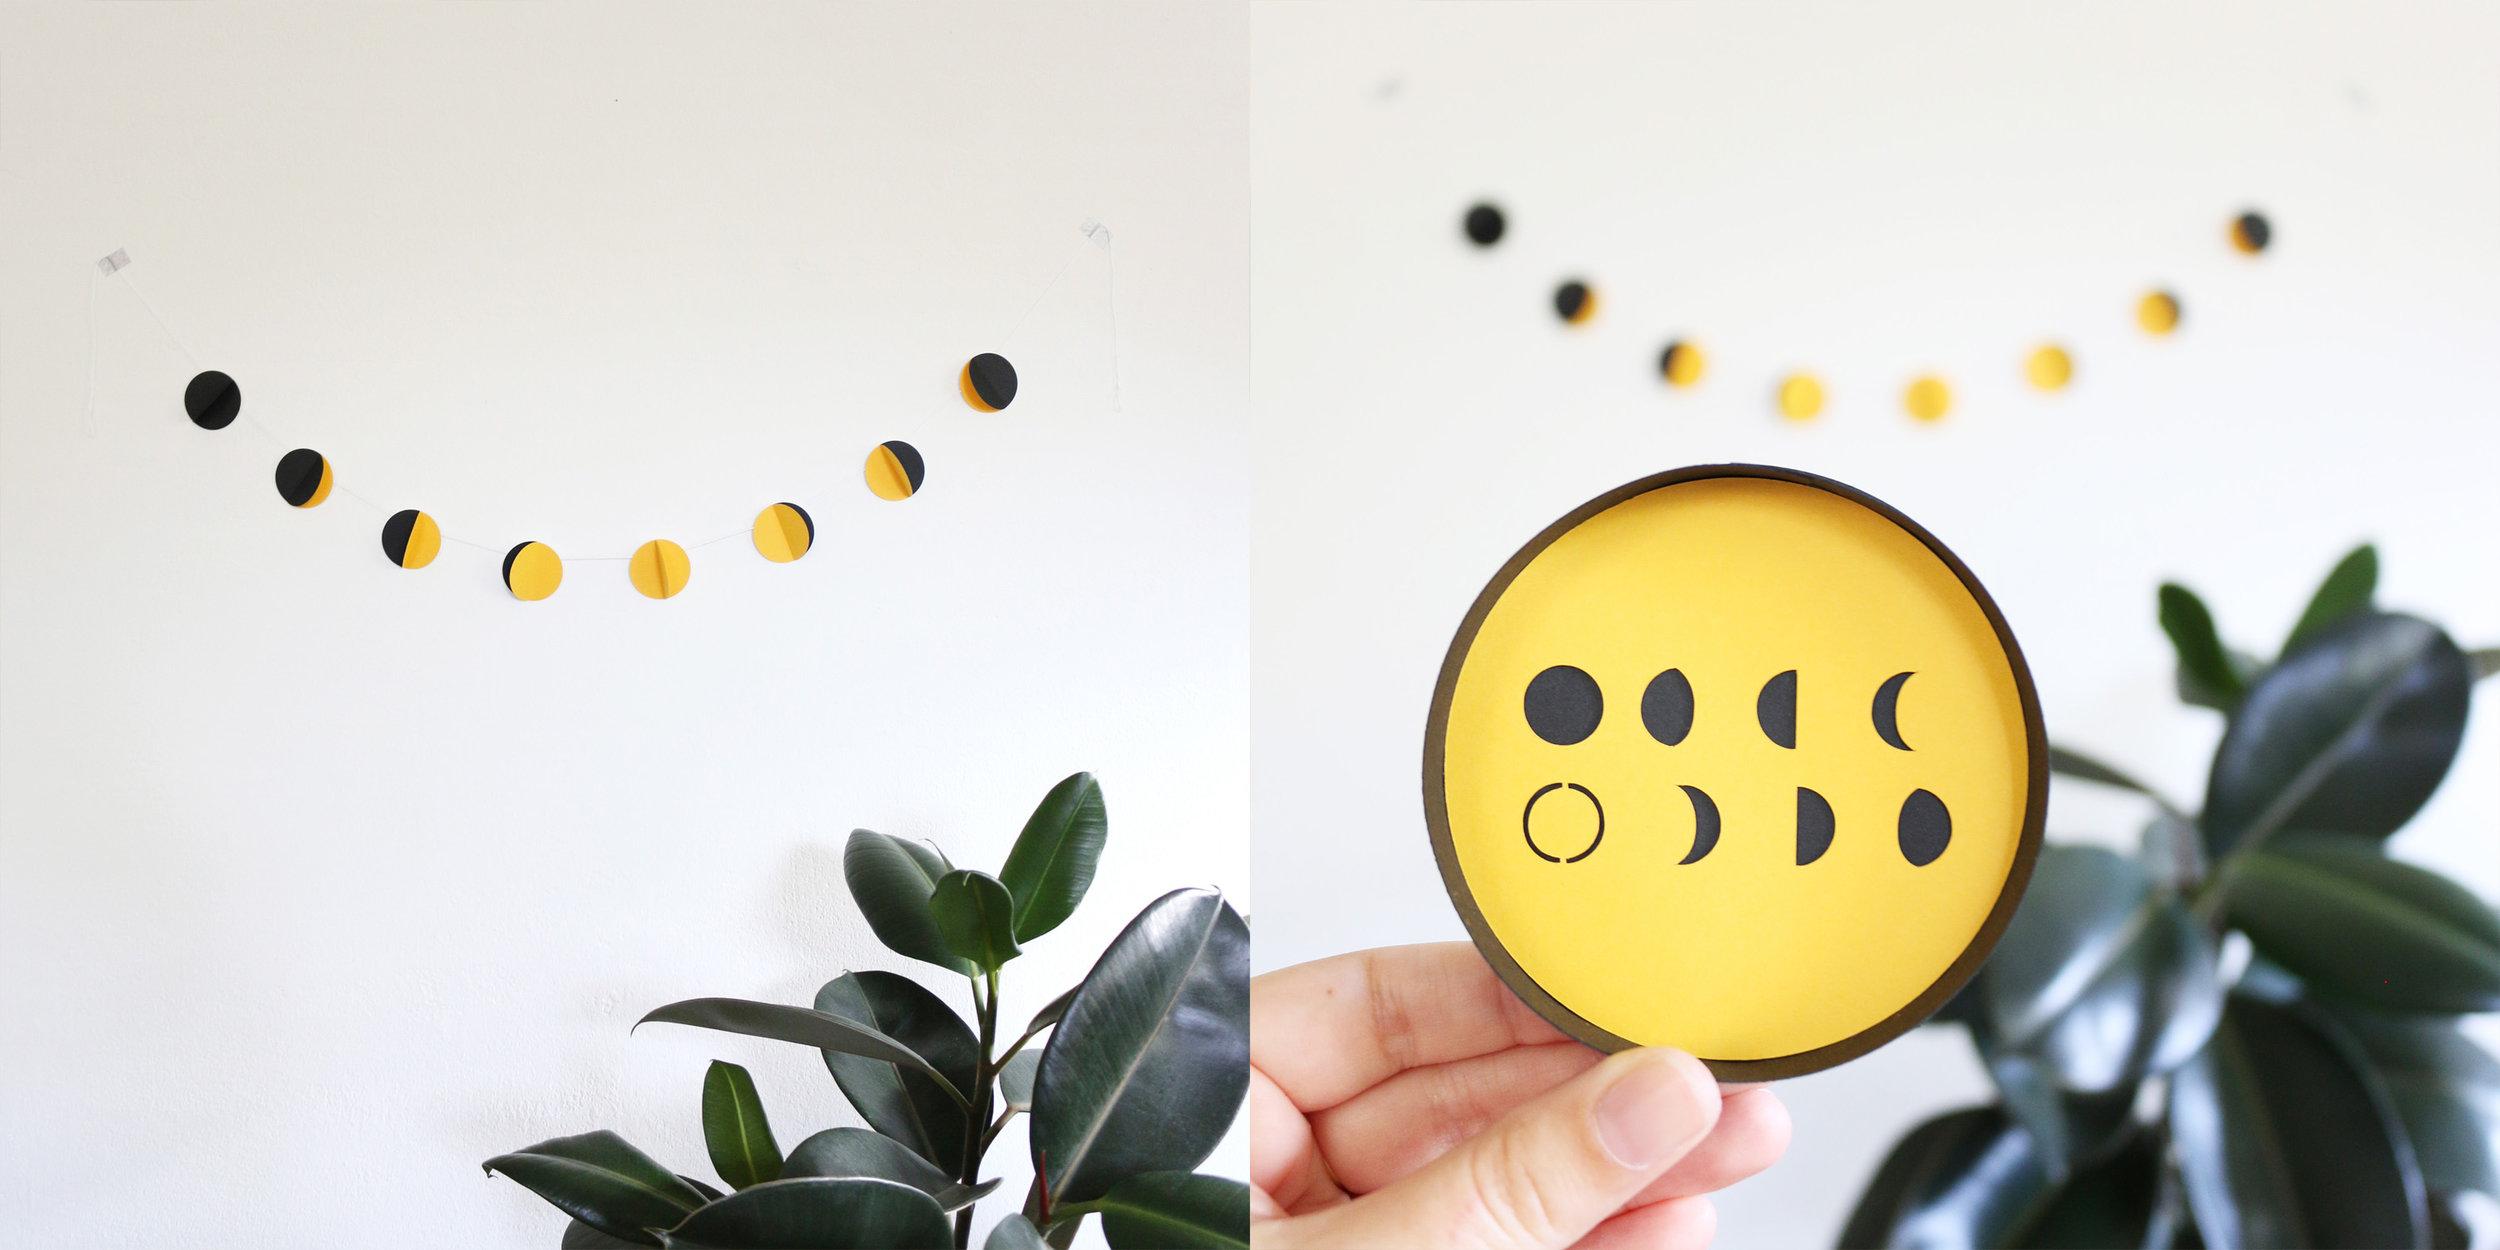 DIY-How-to-Tutorial-Moon-Phases-banner-garland-ashdel-halloween-banner-decoration-ideas.jpg